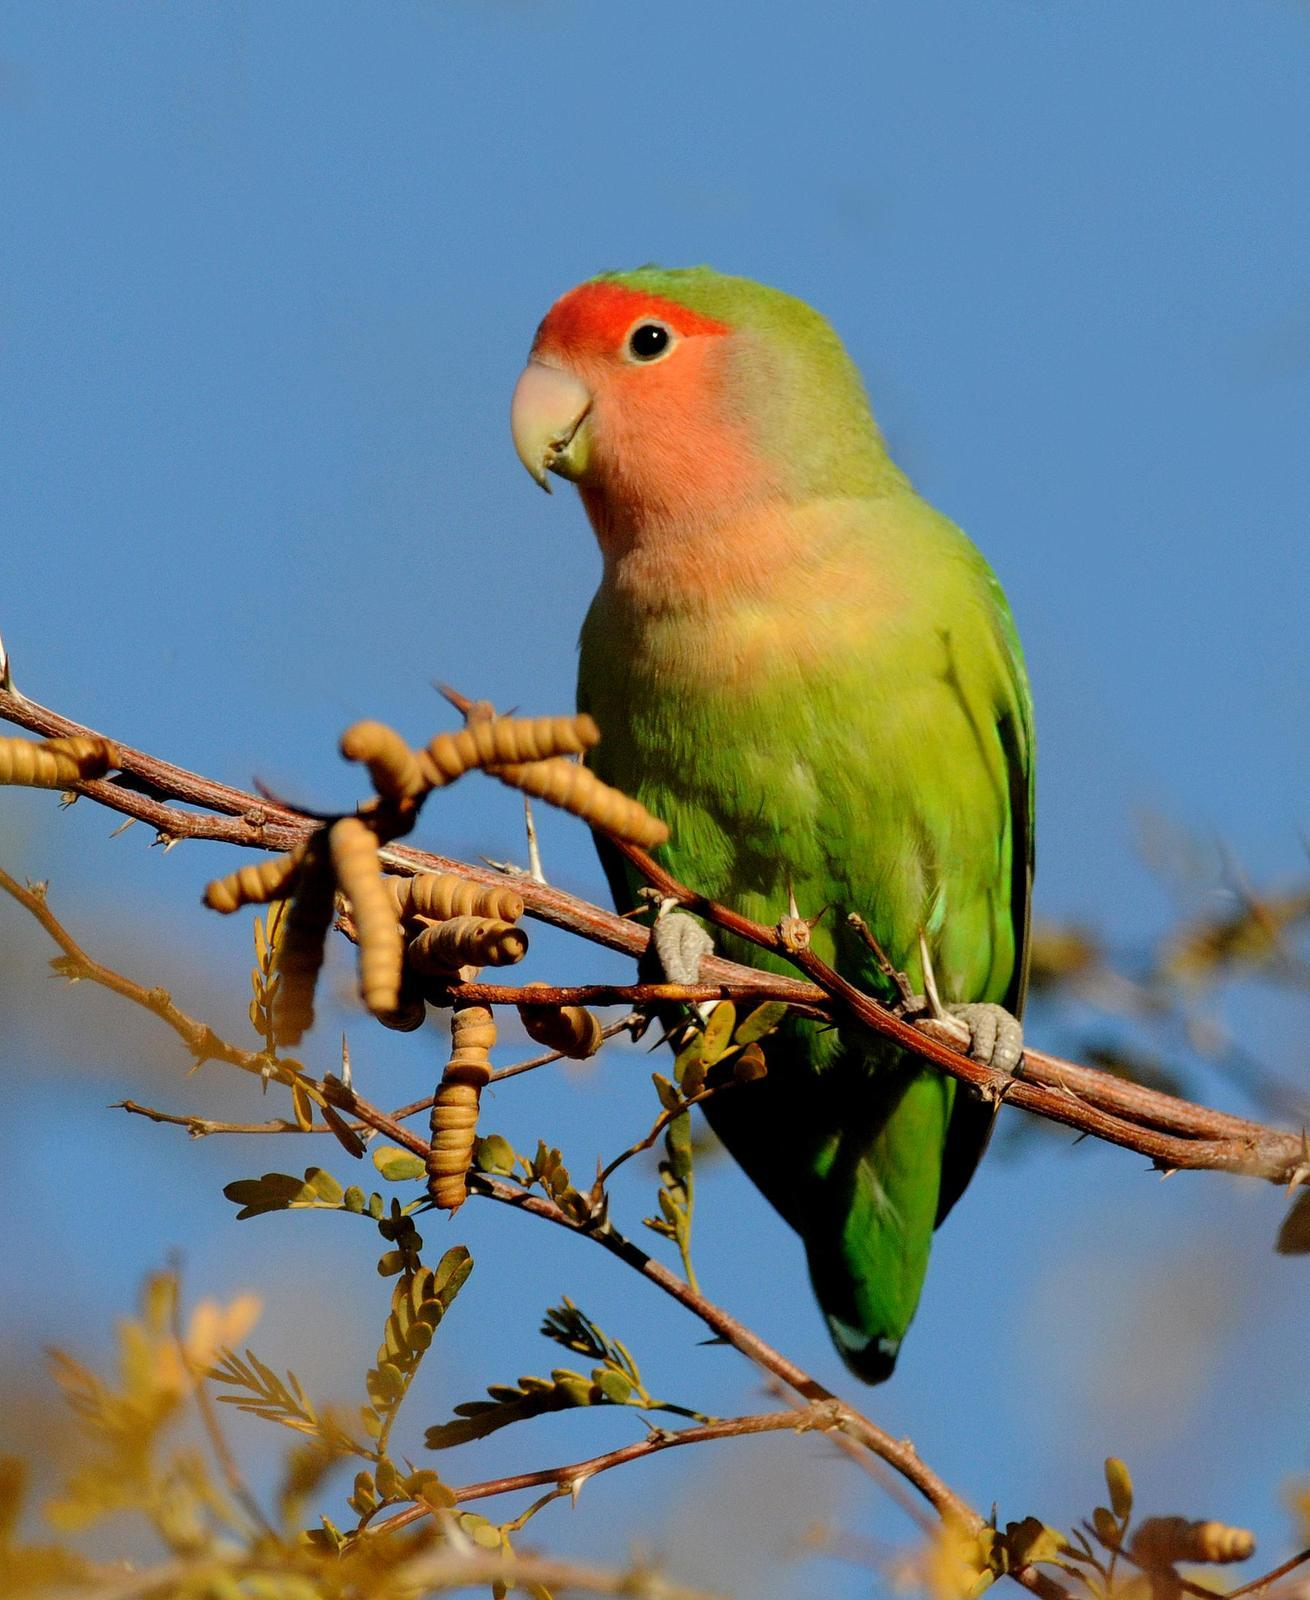 Rosy-faced Lovebird Photo by Steven Mlodinow